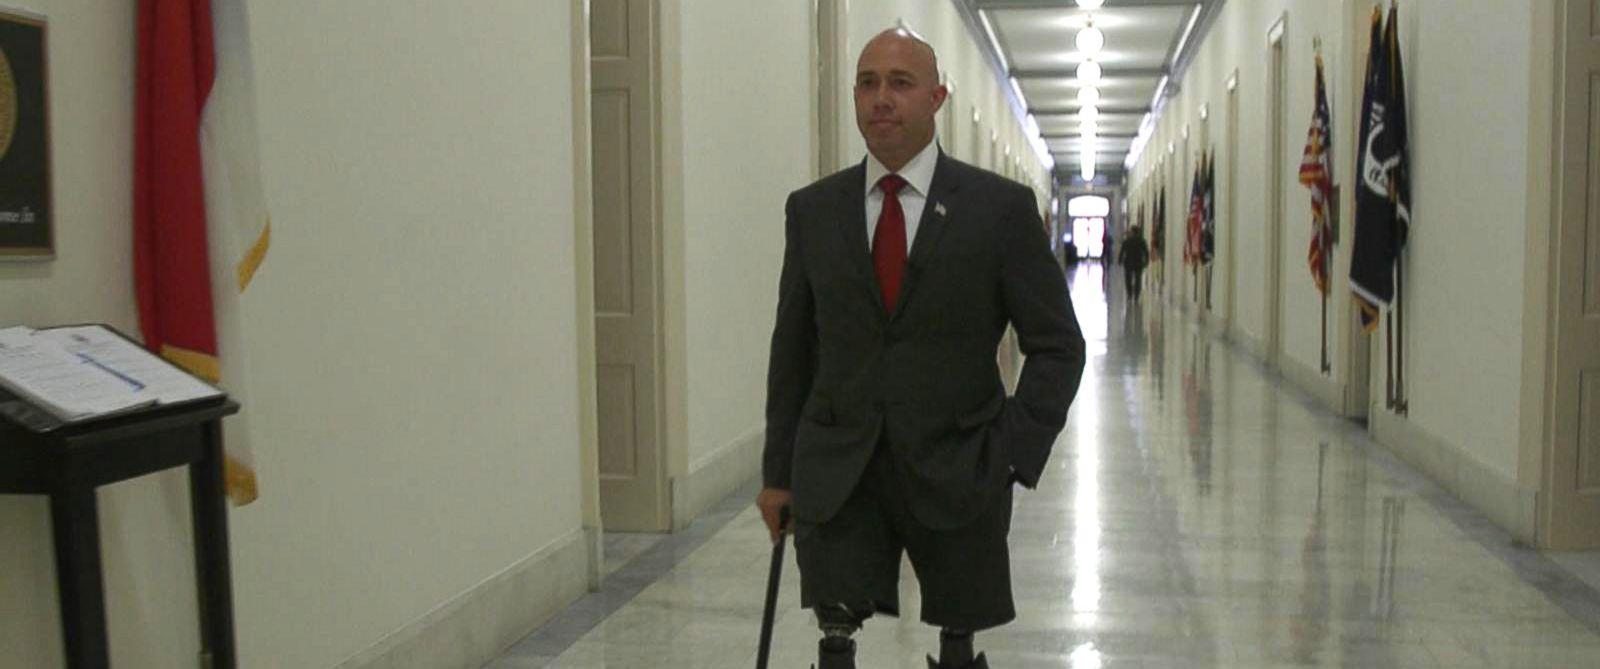 PHOTO: Freshman congressman Brian Mast discusses his transition to Congress.